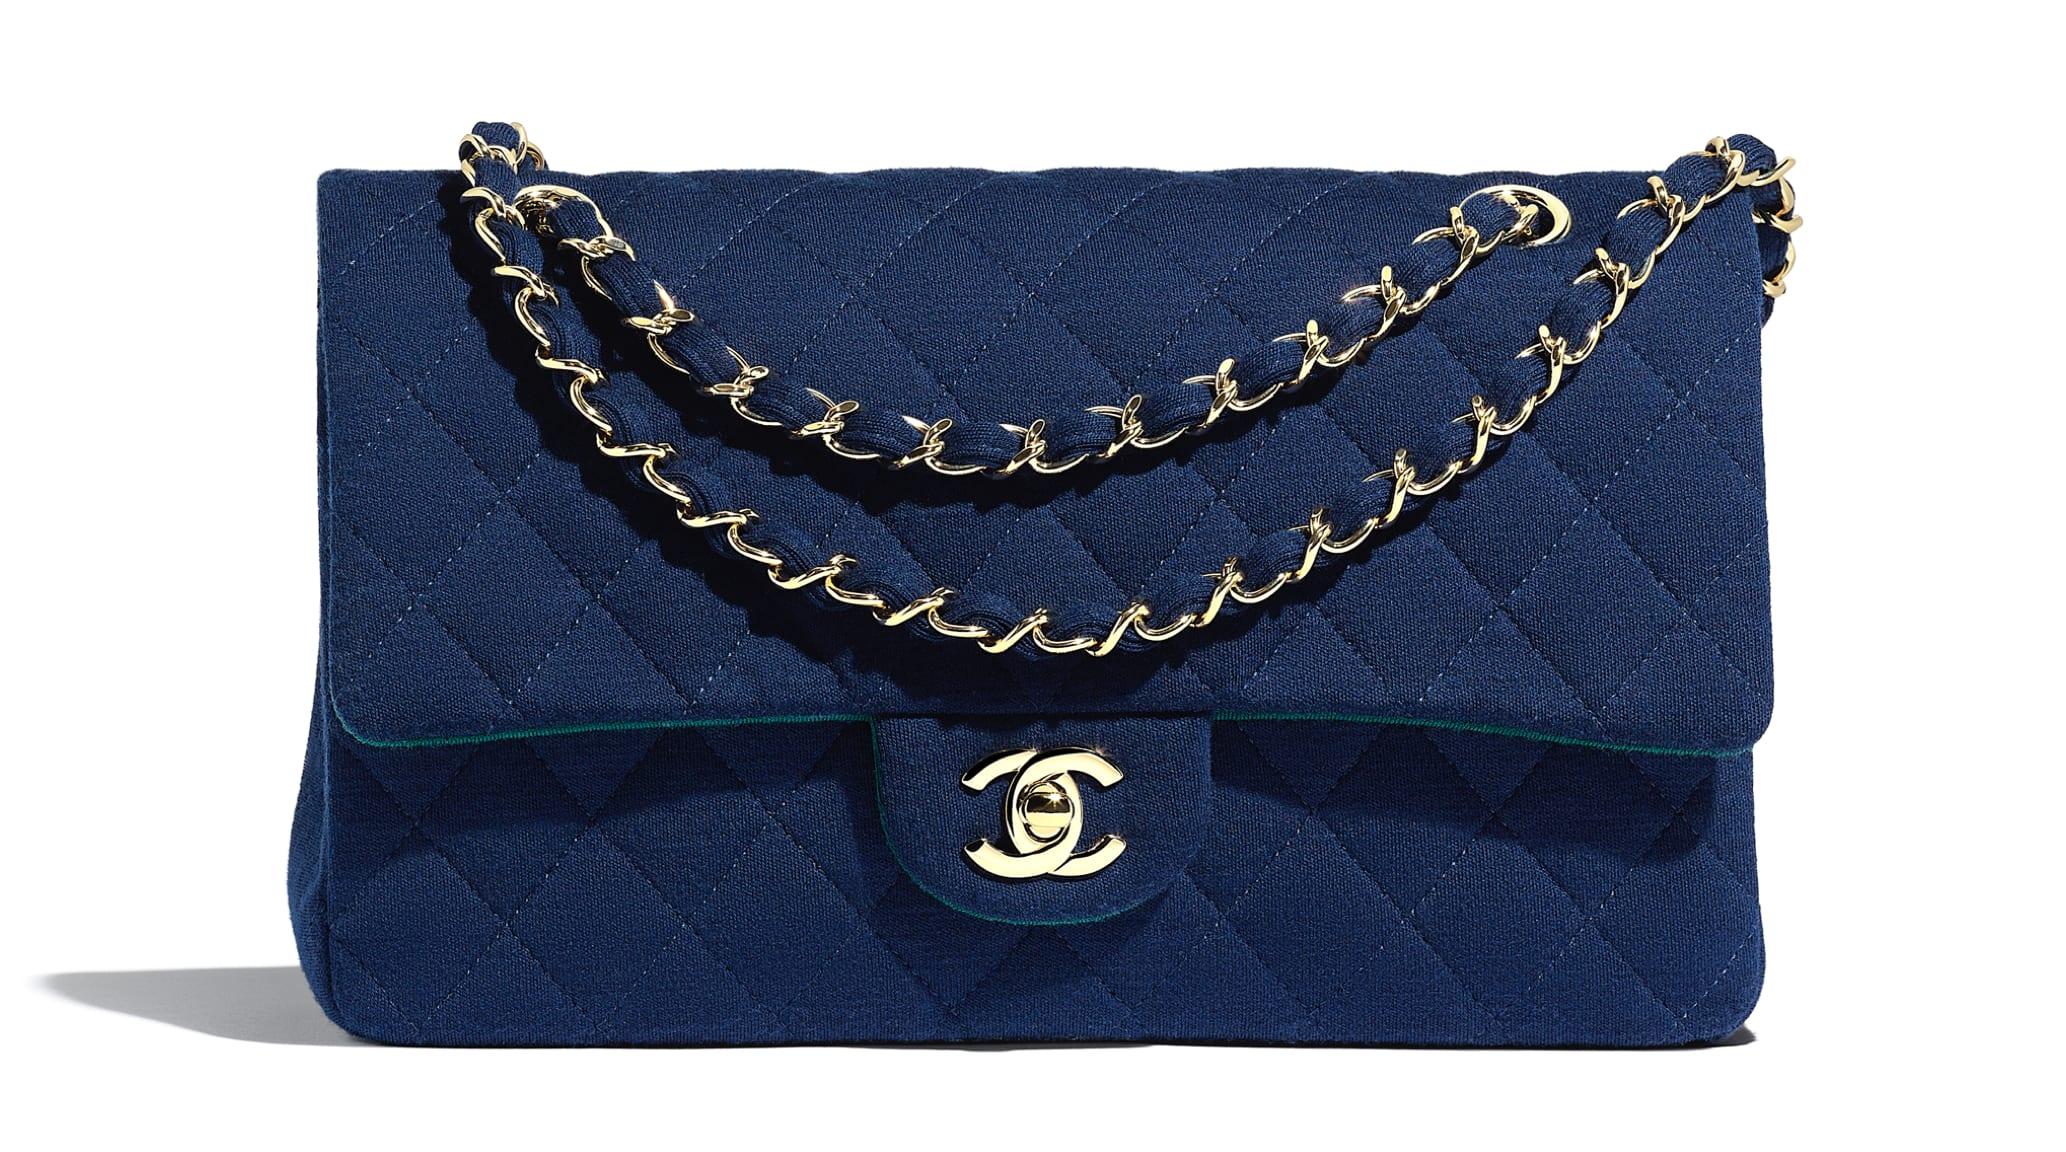 Chanel Handbags Singapore Handbag Reviews 2018